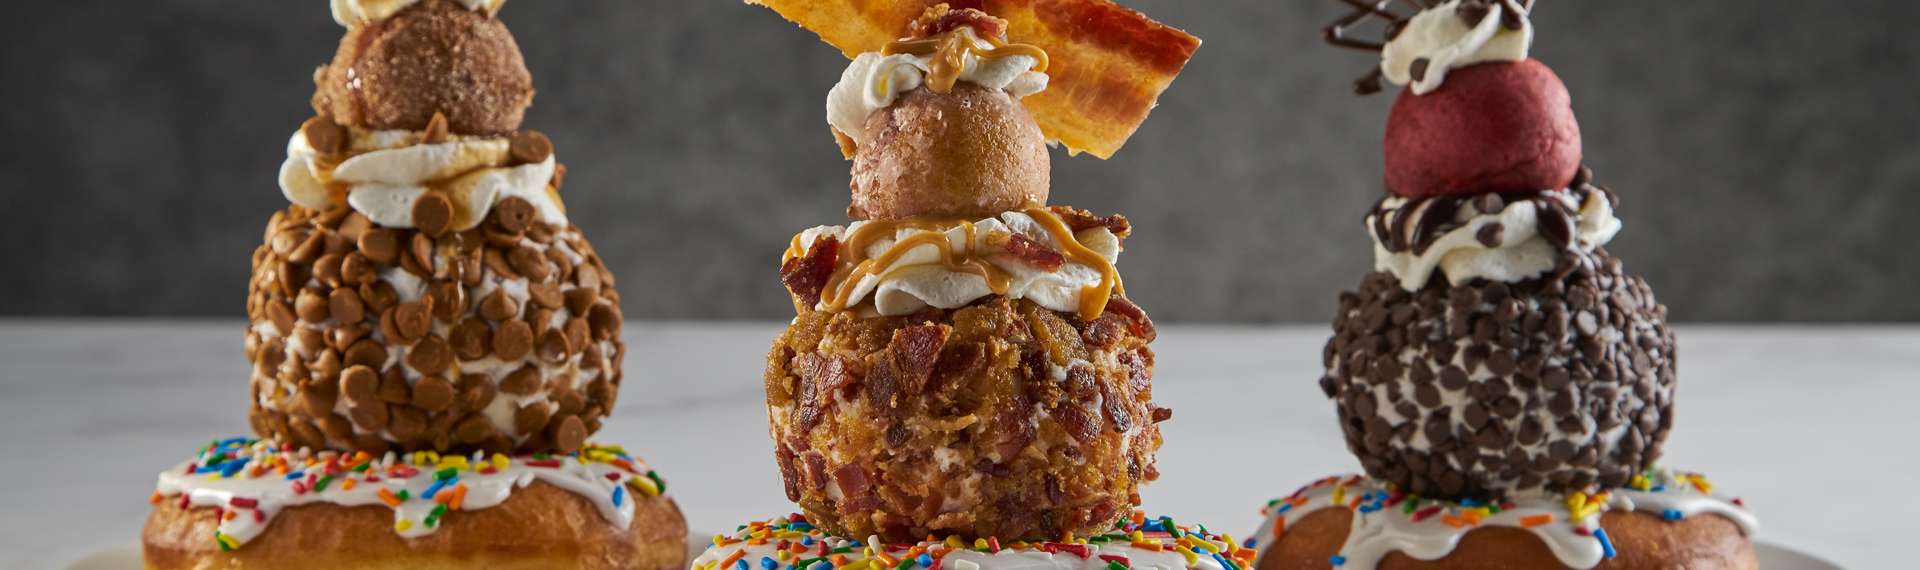 I SCREAM FOR DONUTS! Sundae - Single Serve